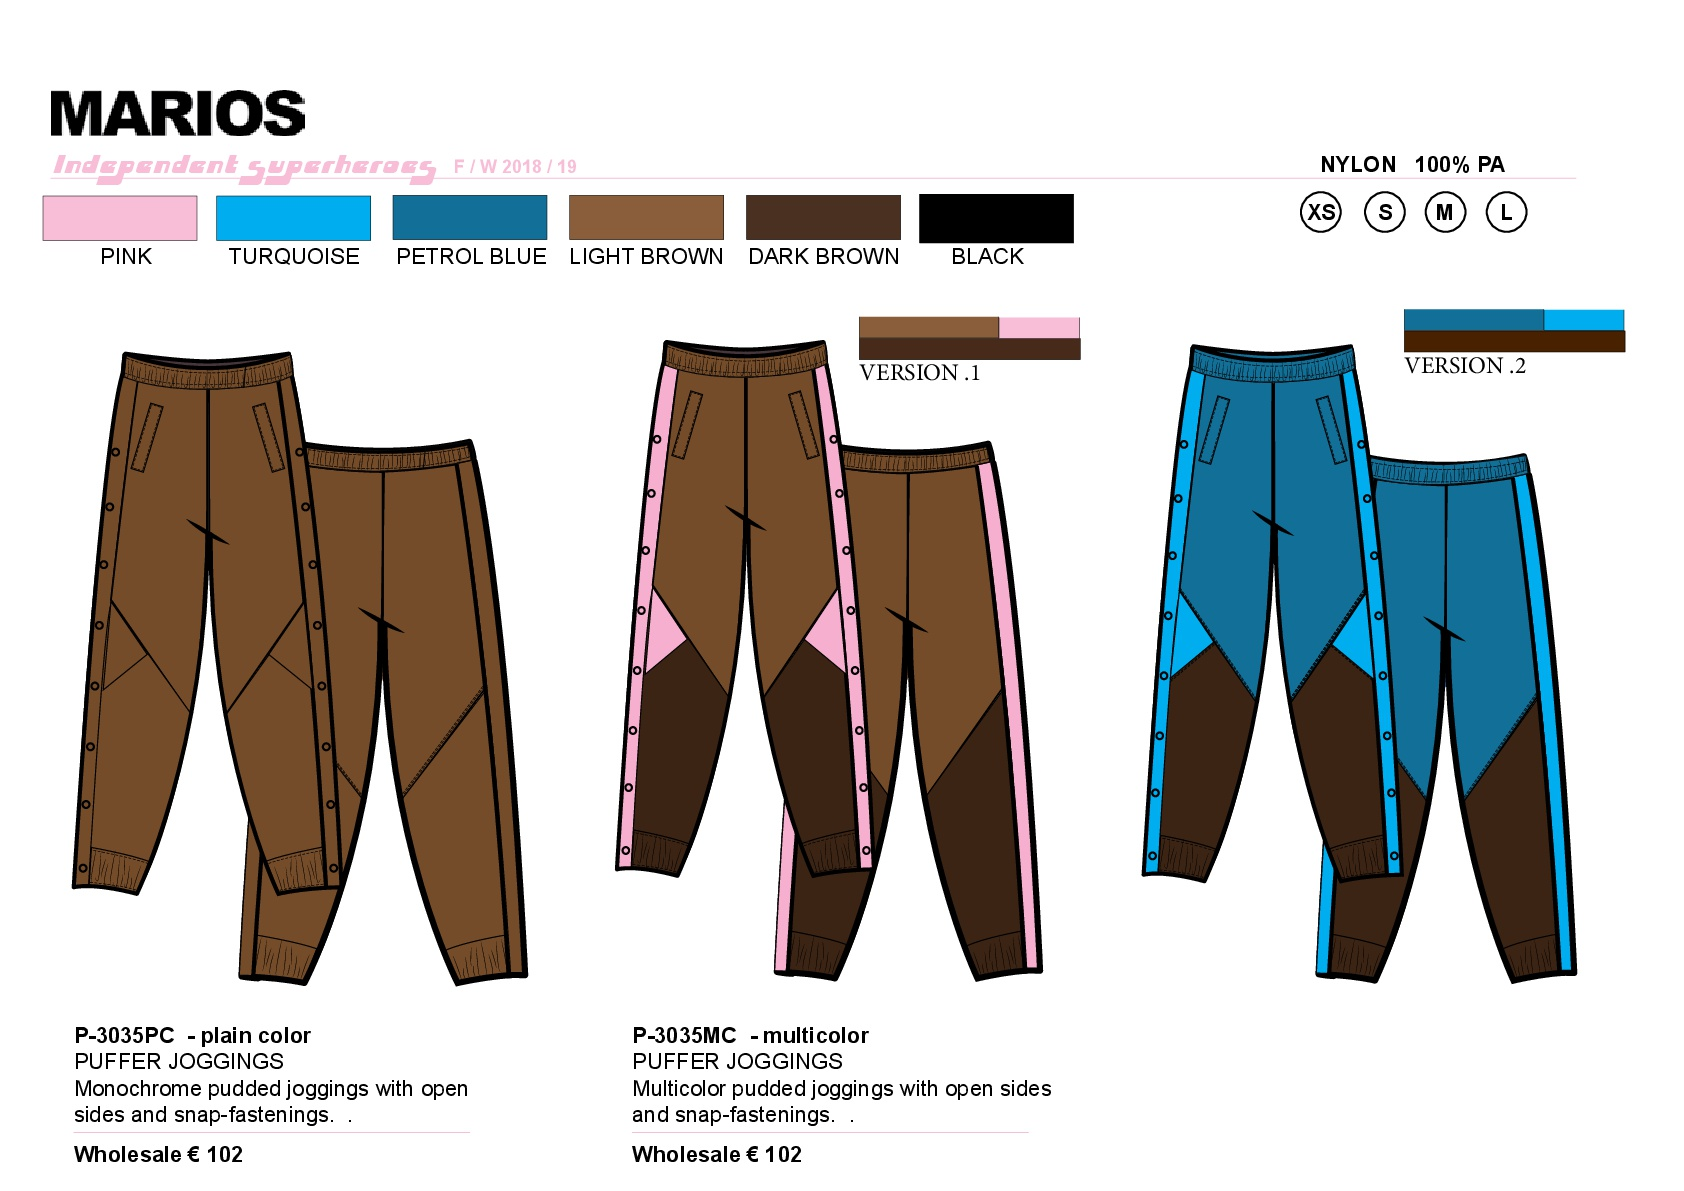 F:W-18-19-MARIOS-LINESHEET-indipendent-superheroes-buying-office-015.jpg